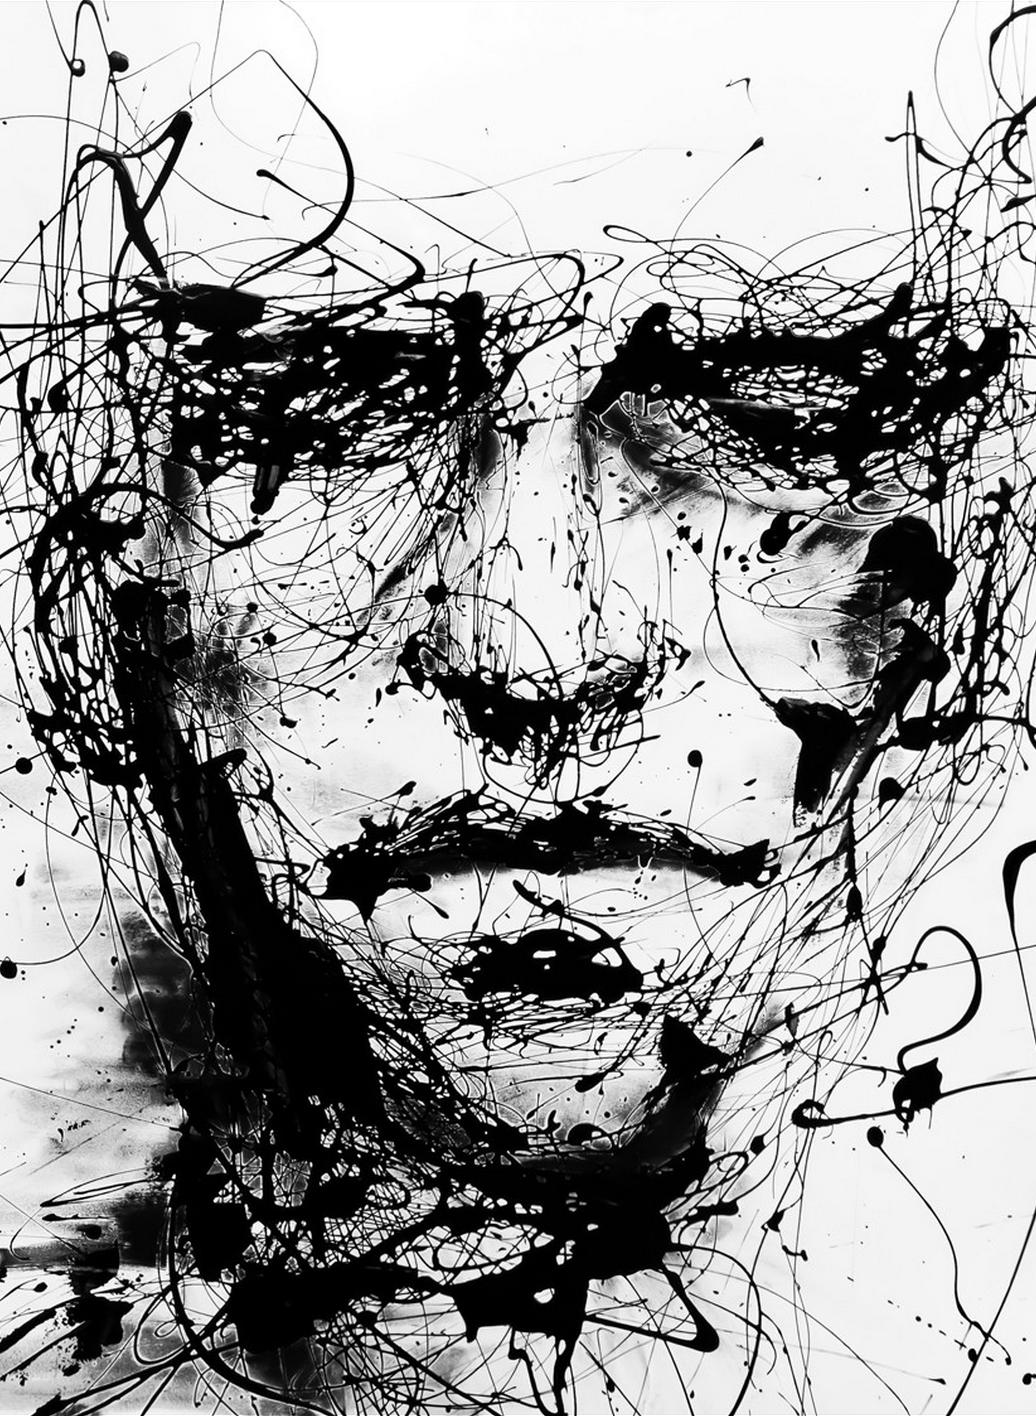 Fine Line Art : Lines hold the memories fine art prints by agnes cecile